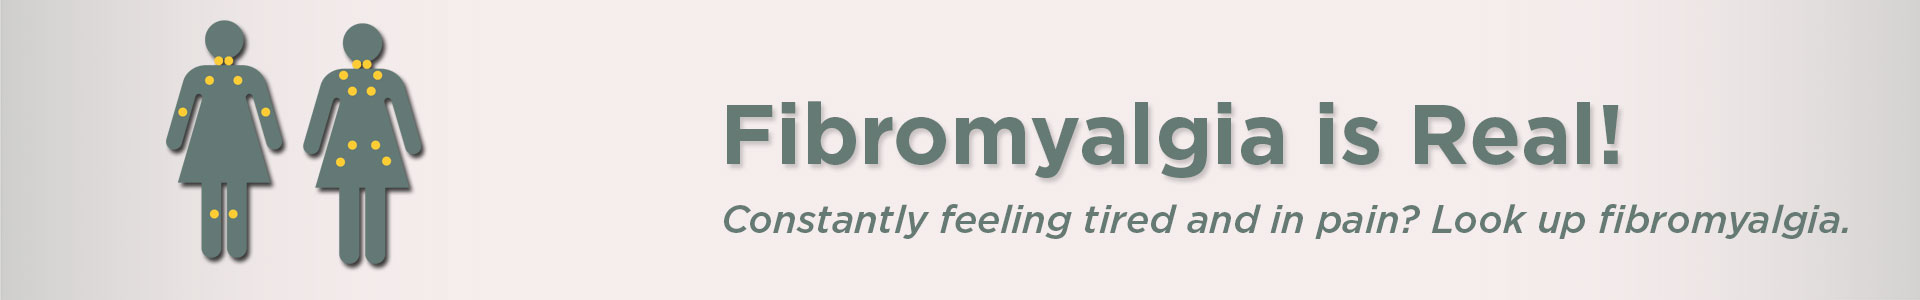 Fibromyalgia page header image Dr. Emel Gokmen